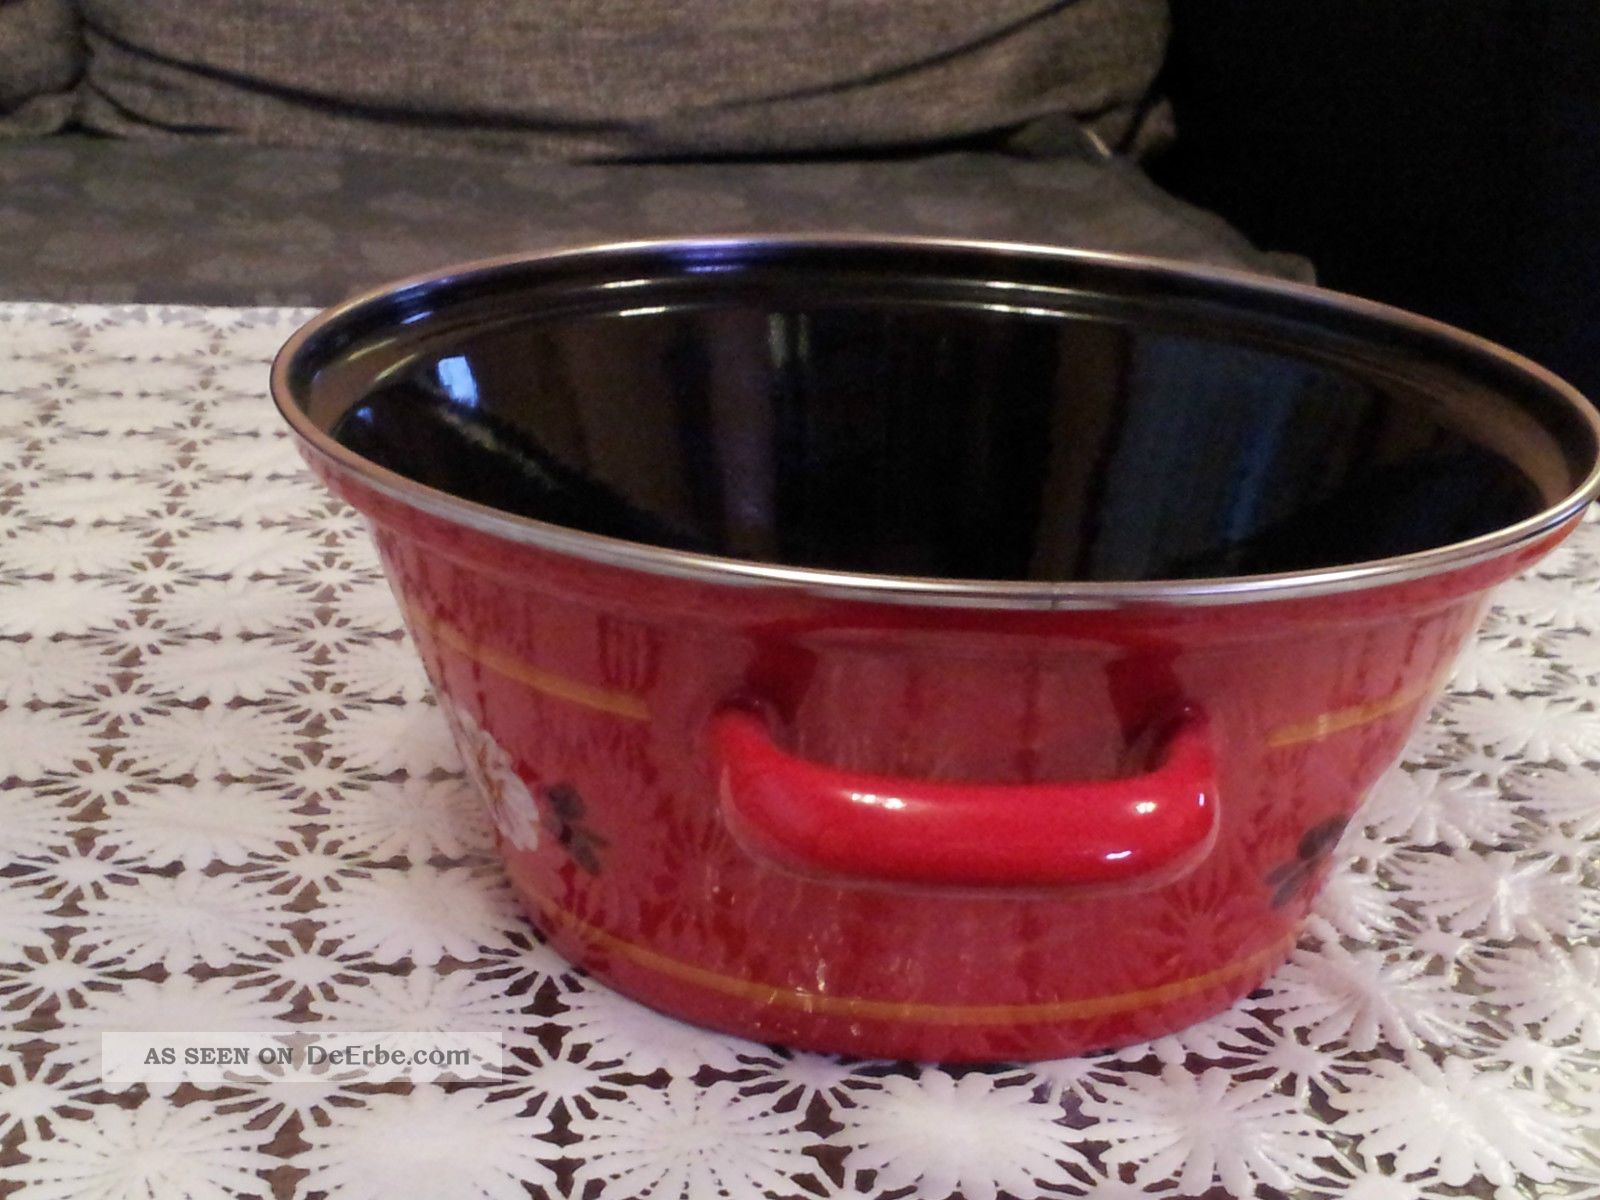 emaille topf vintage kochtopf topf kasserolle rot mit blumen. Black Bedroom Furniture Sets. Home Design Ideas